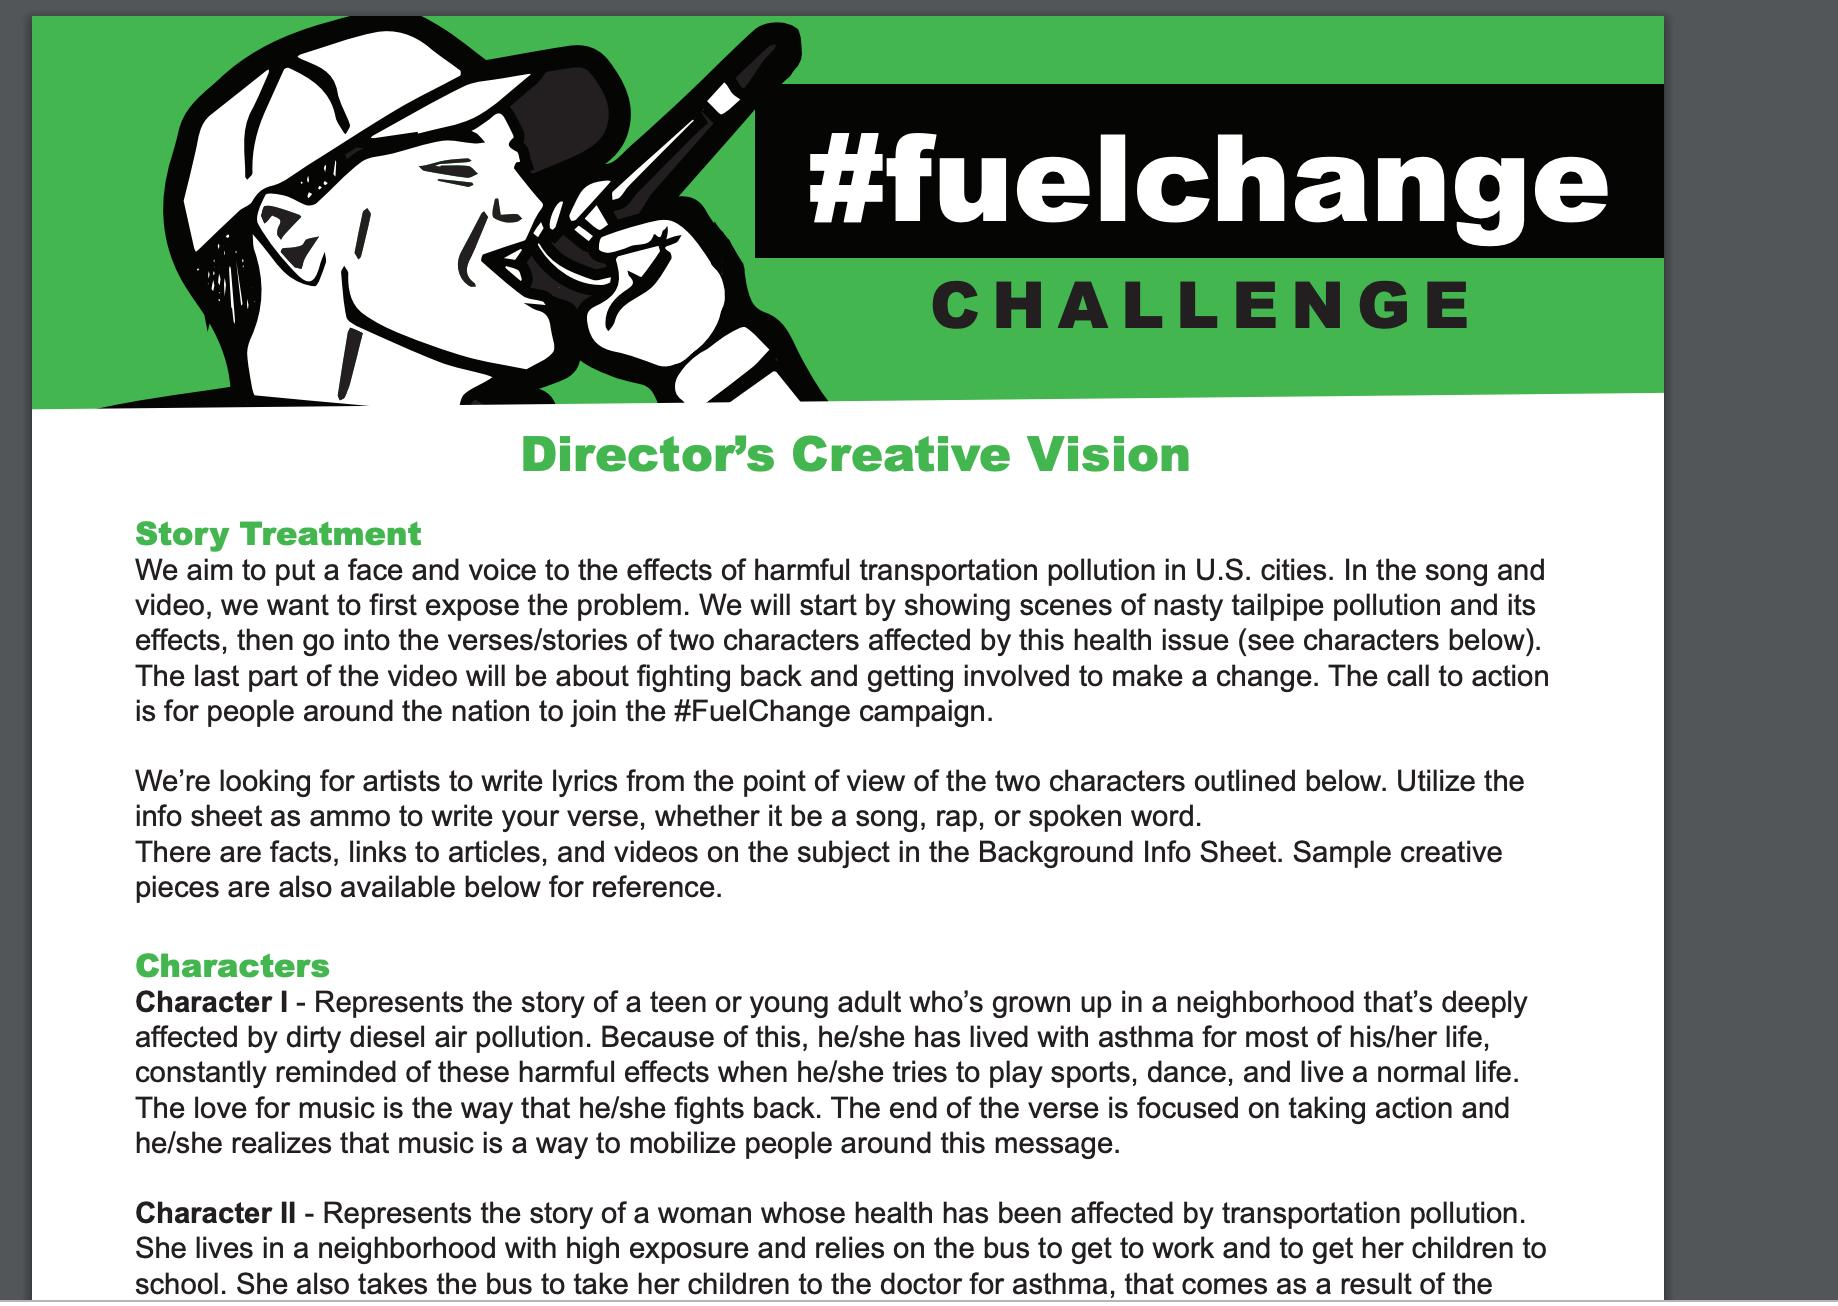 Fuel Change Challenge Director's Creative Vision